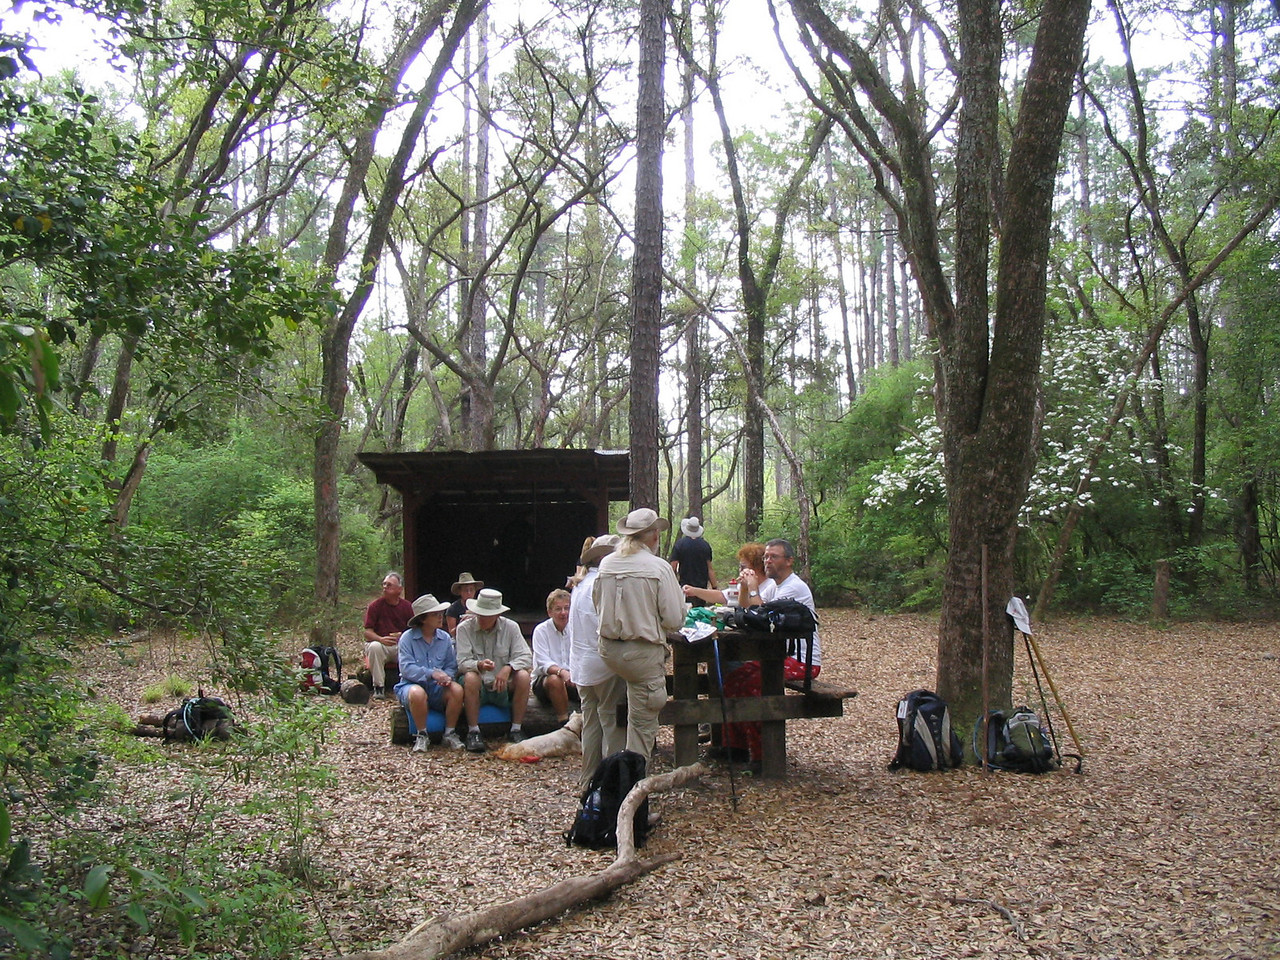 Jackson Trail Shelter<br /> PHOTO CREDIT: Linda Benton/Florida Trail Association